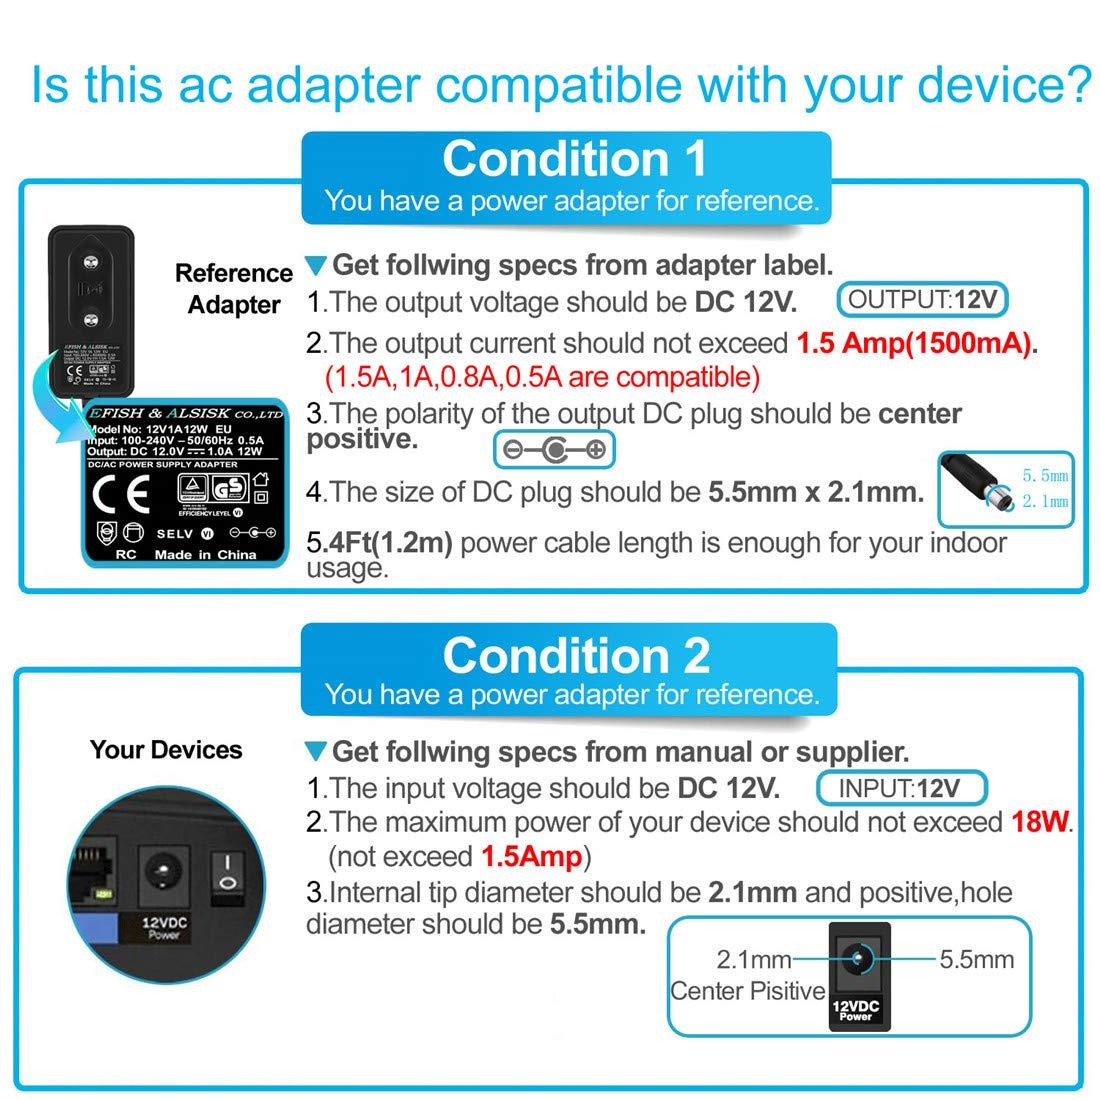 EFISH Adaptador de alimentación 12V 1A | Adaptador de Enchufe de CA DC de 1Amp para electrodomésticos Cámara CCTV,Teclado Yamaha,Enrutador,Eje,Interruptor ...